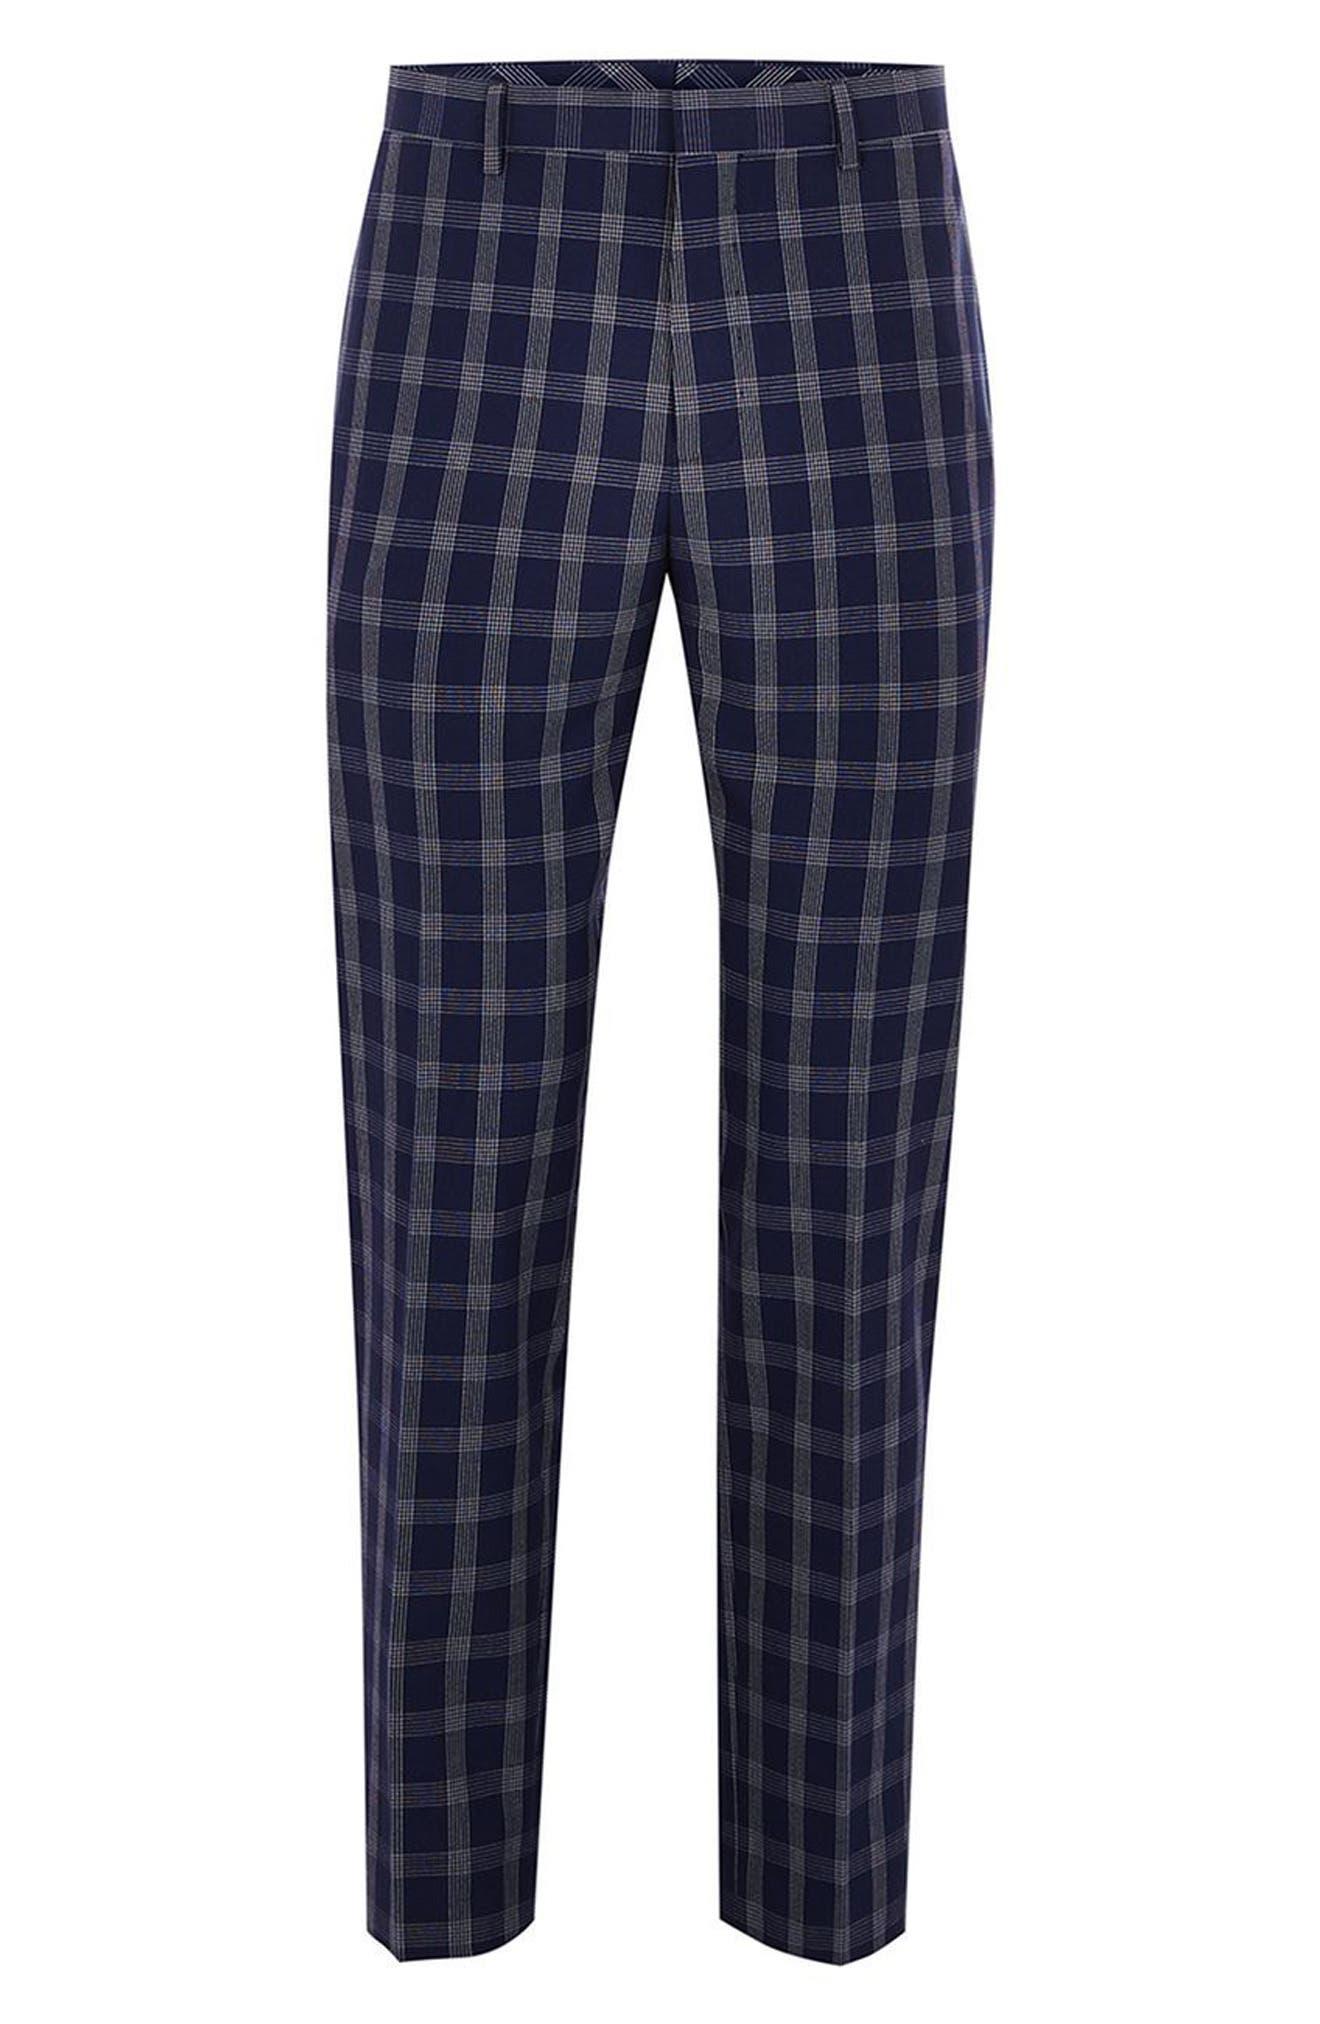 Muscle Fit Check Suit Trousers,                             Alternate thumbnail 3, color,                             NAVY BLUE MULTI